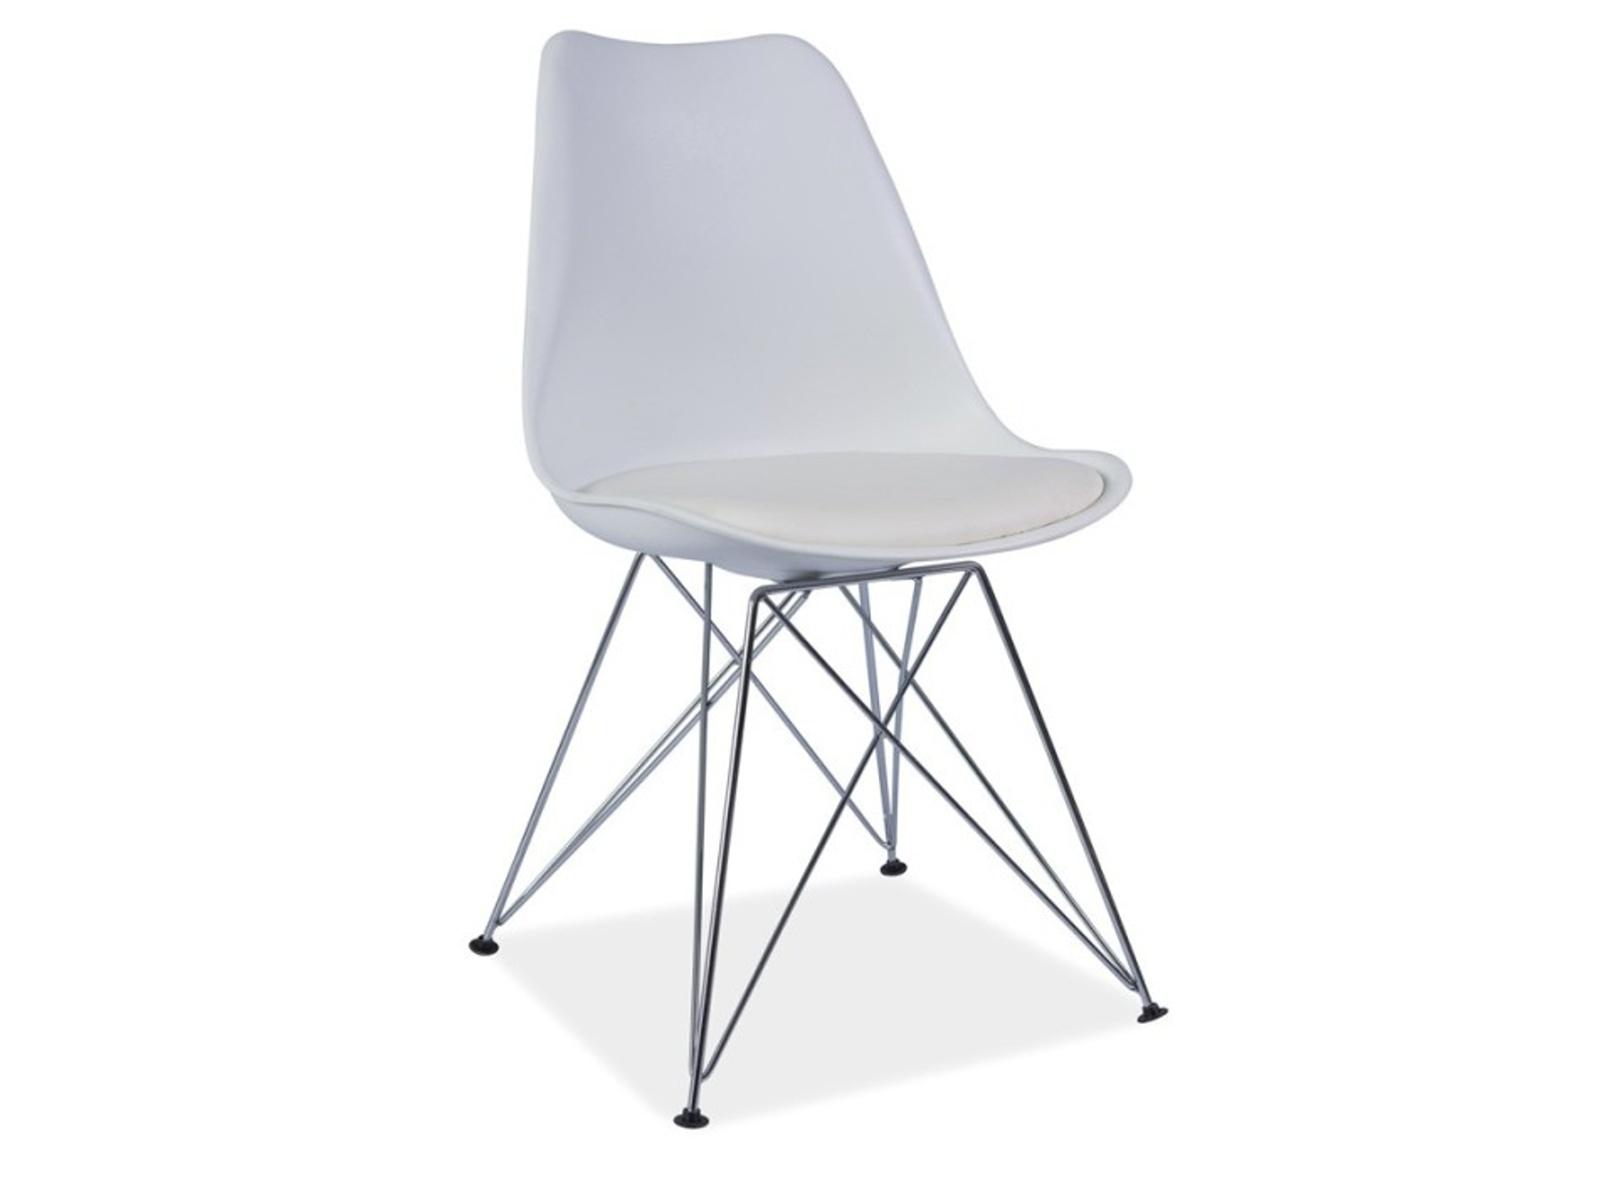 Smartshop Jídelní židle METAL NEW, bílá